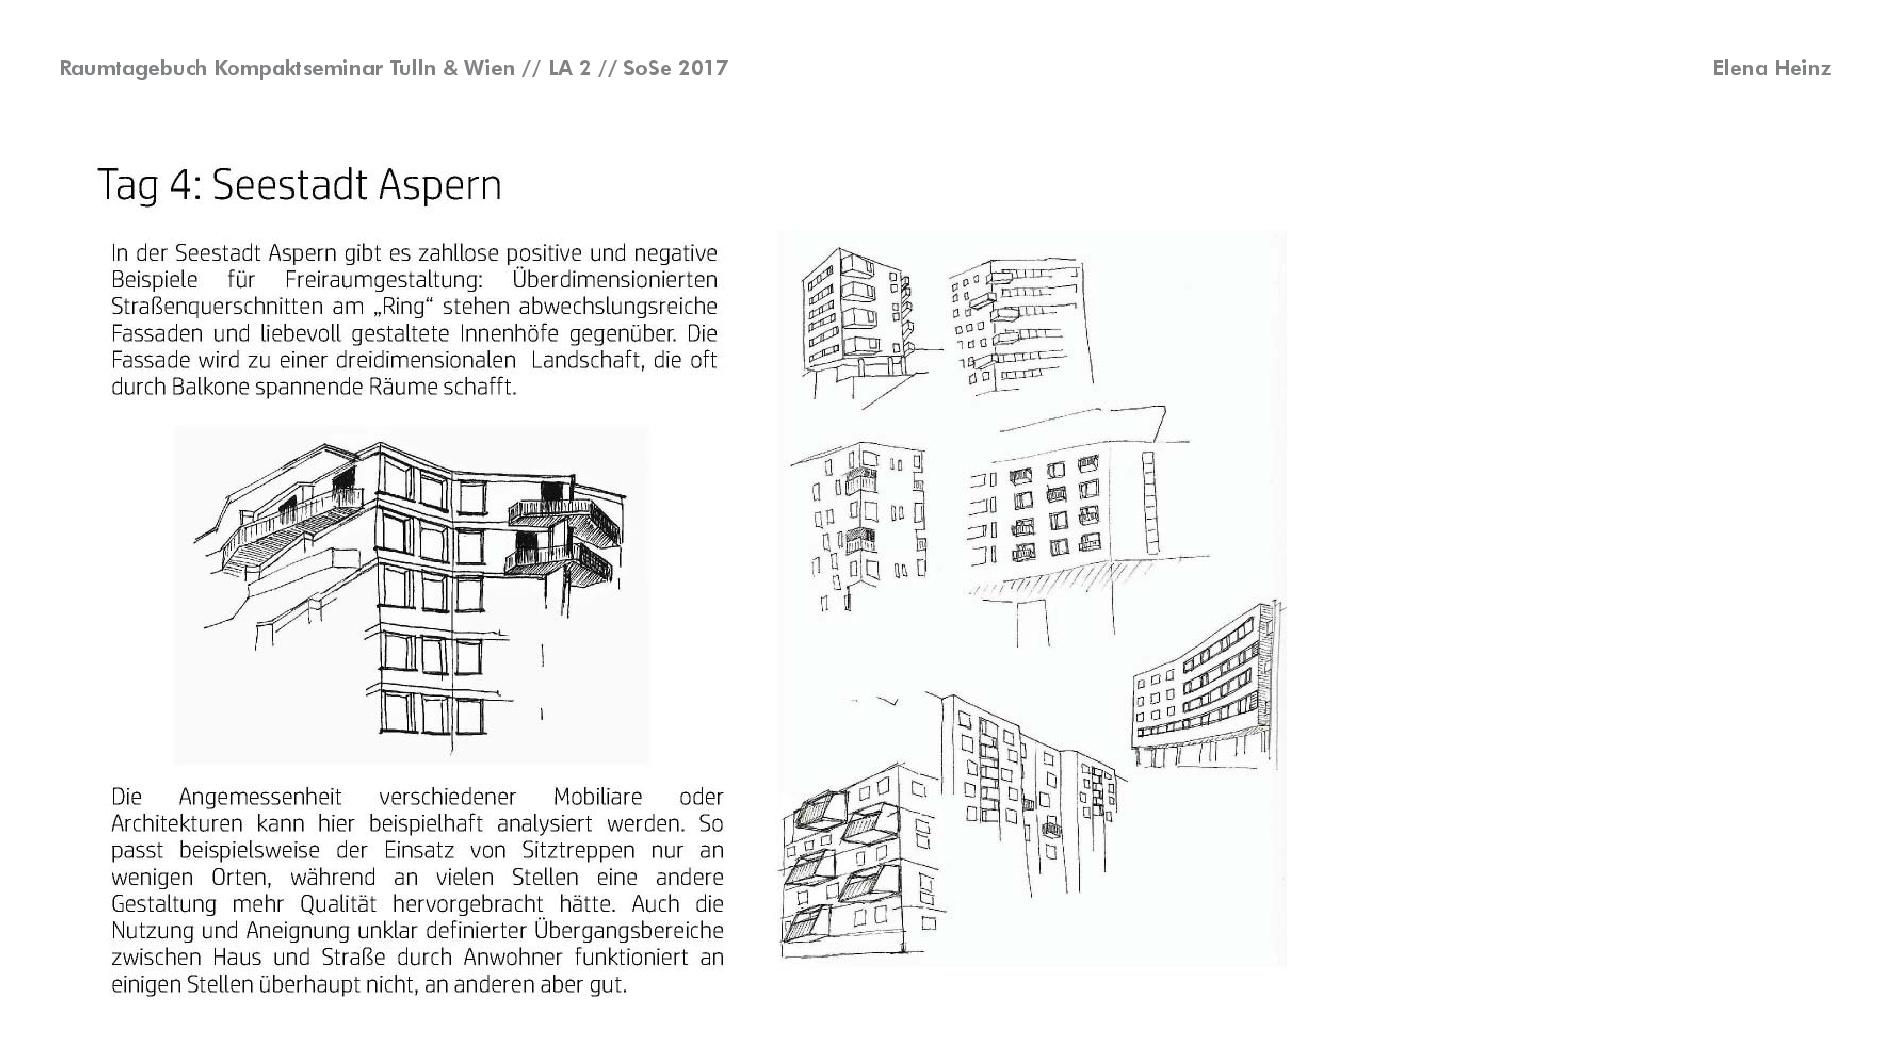 NEU Screen Raumtagebuch Tulln Wien SoSe 17 020